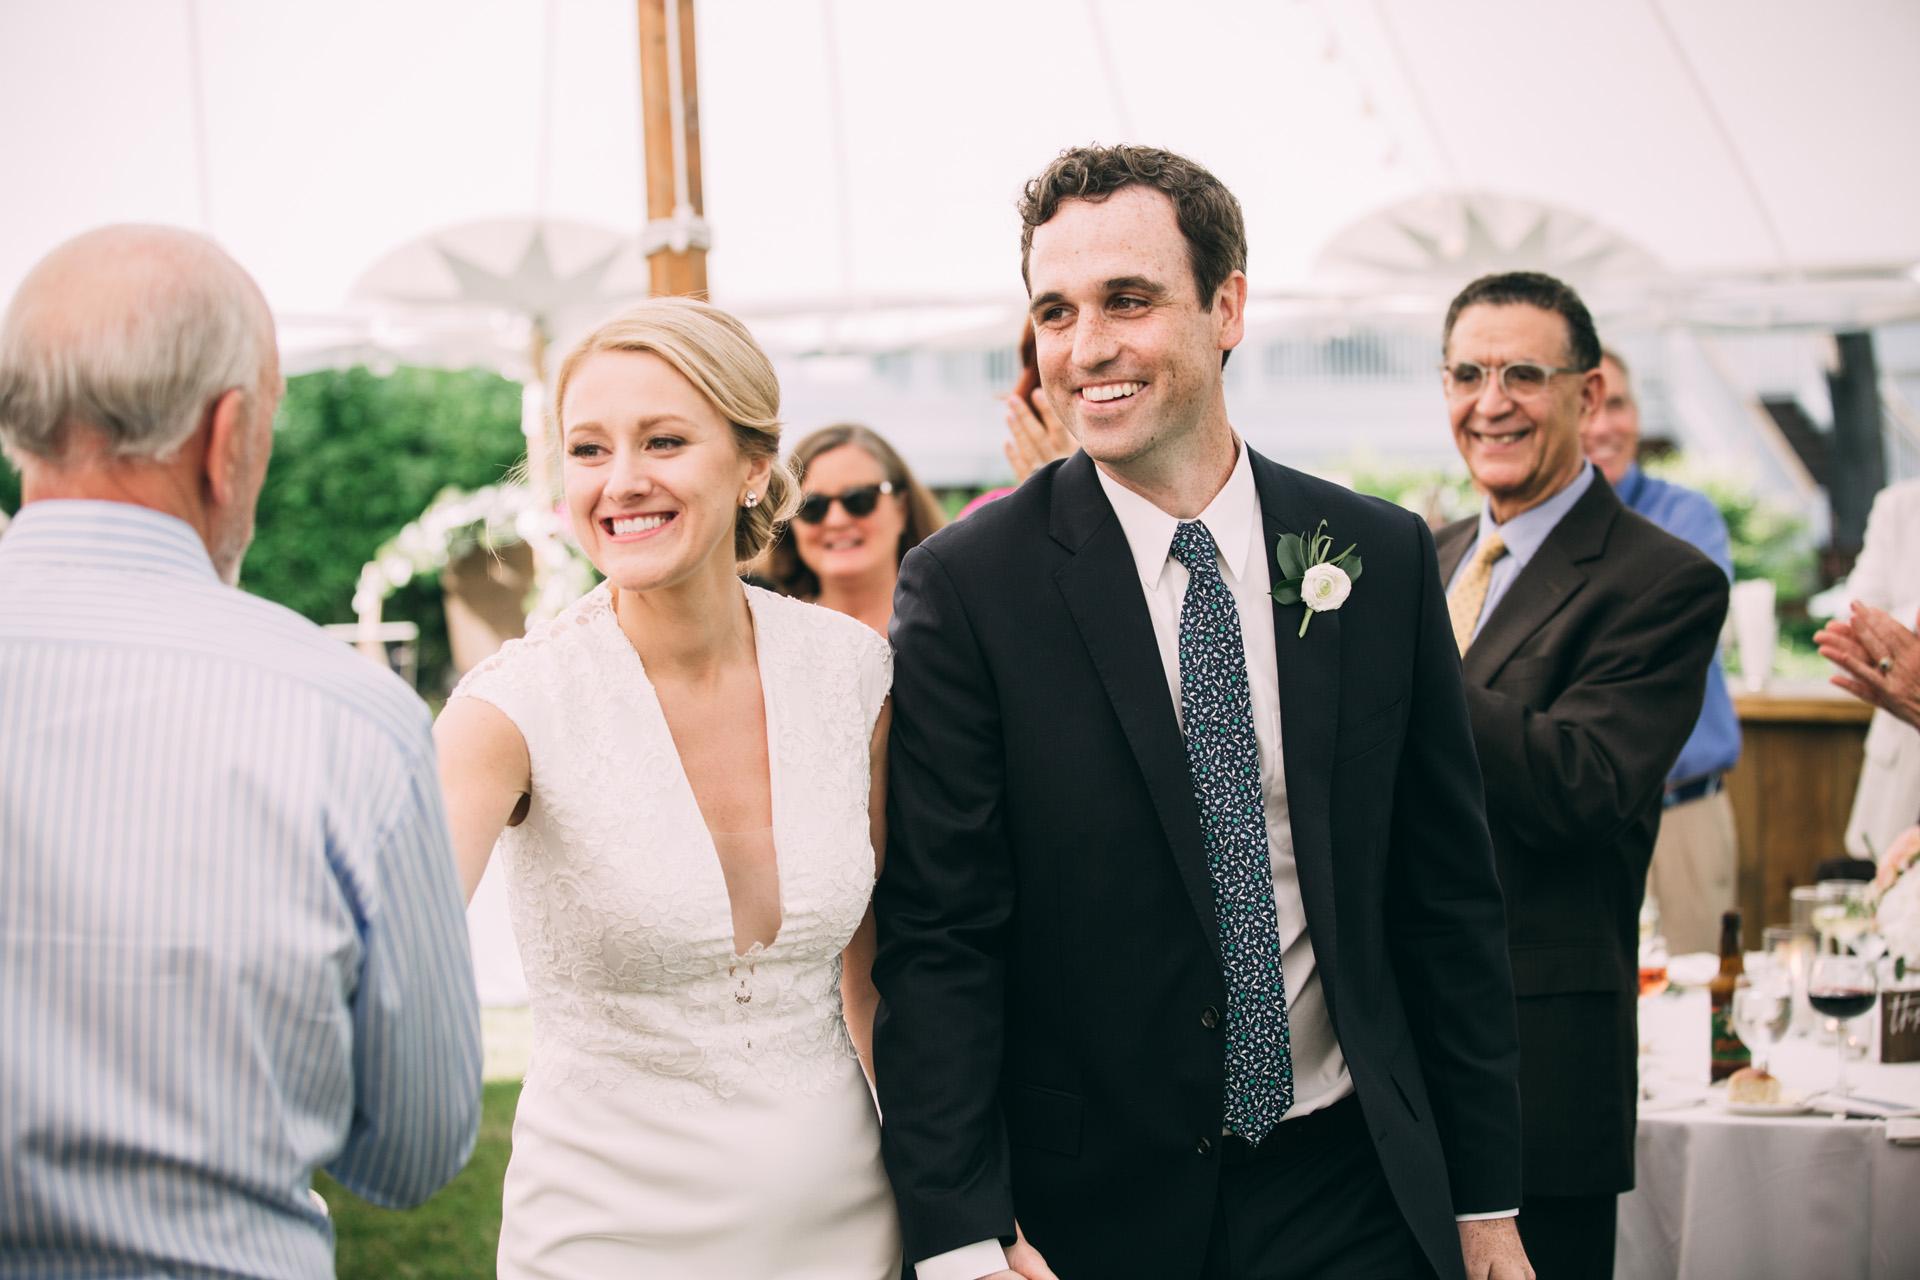 woodstock-inn-vermont-wedding-28